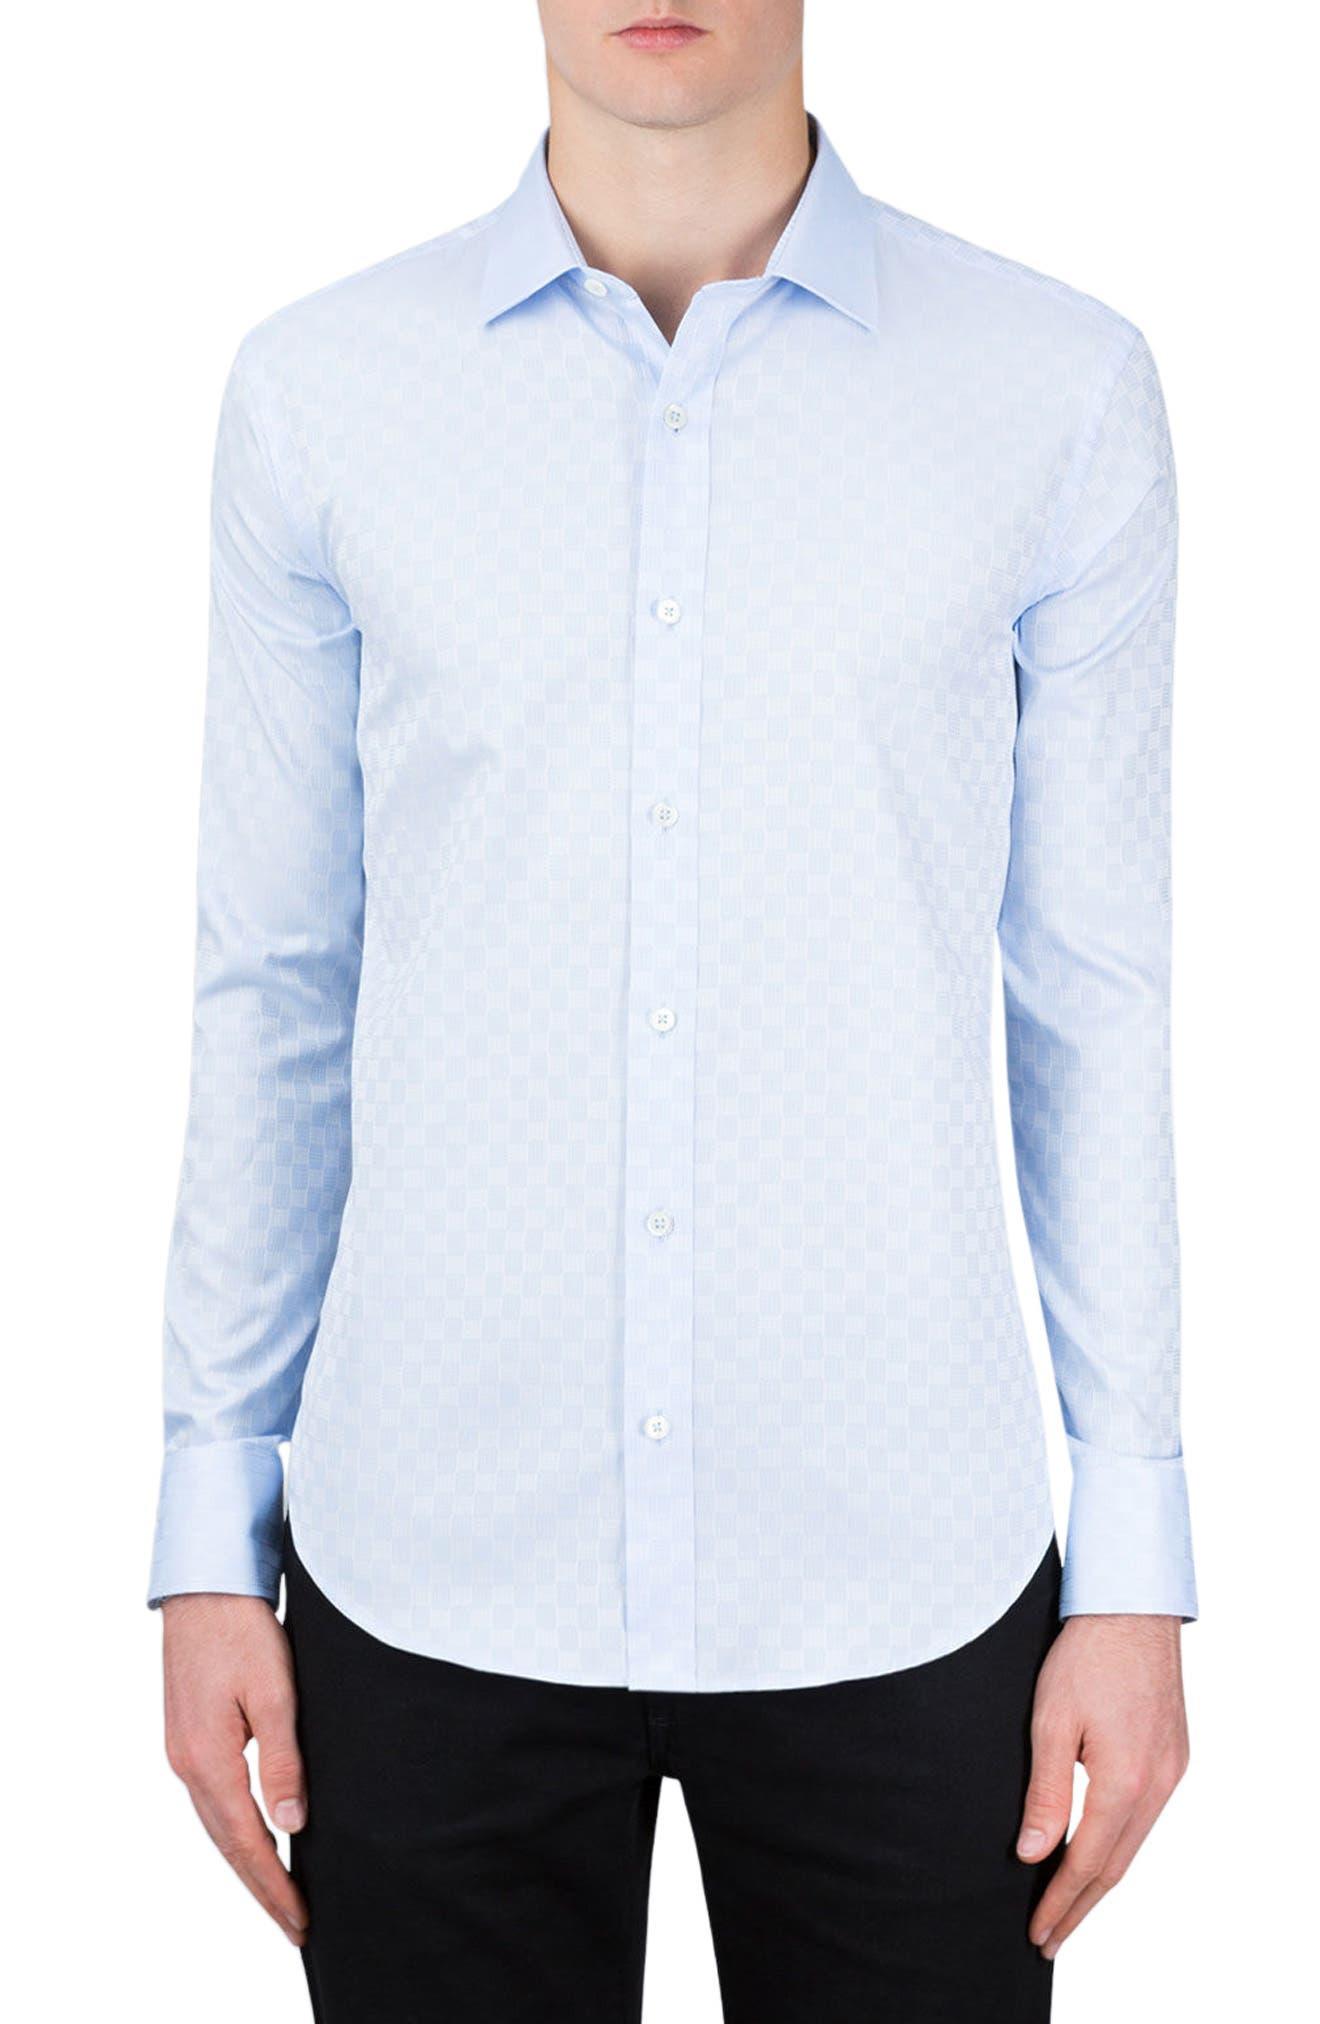 Alternate Image 1 Selected - Bugatchi Classic Fit Optic Print Sport Shirt